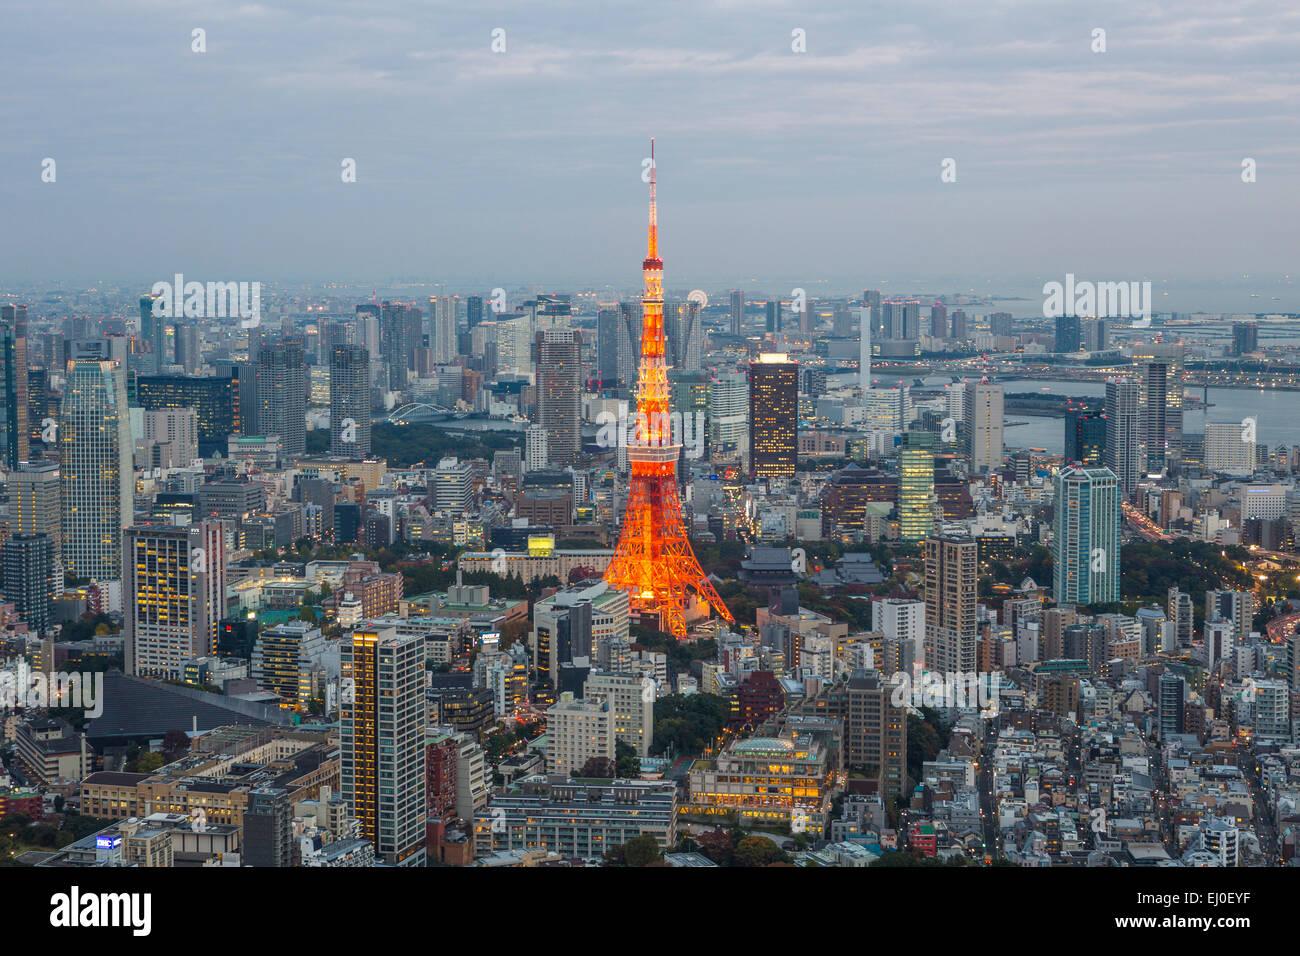 City japan asien landschaft roppongi hills tokyo - Architektur tokyo ...